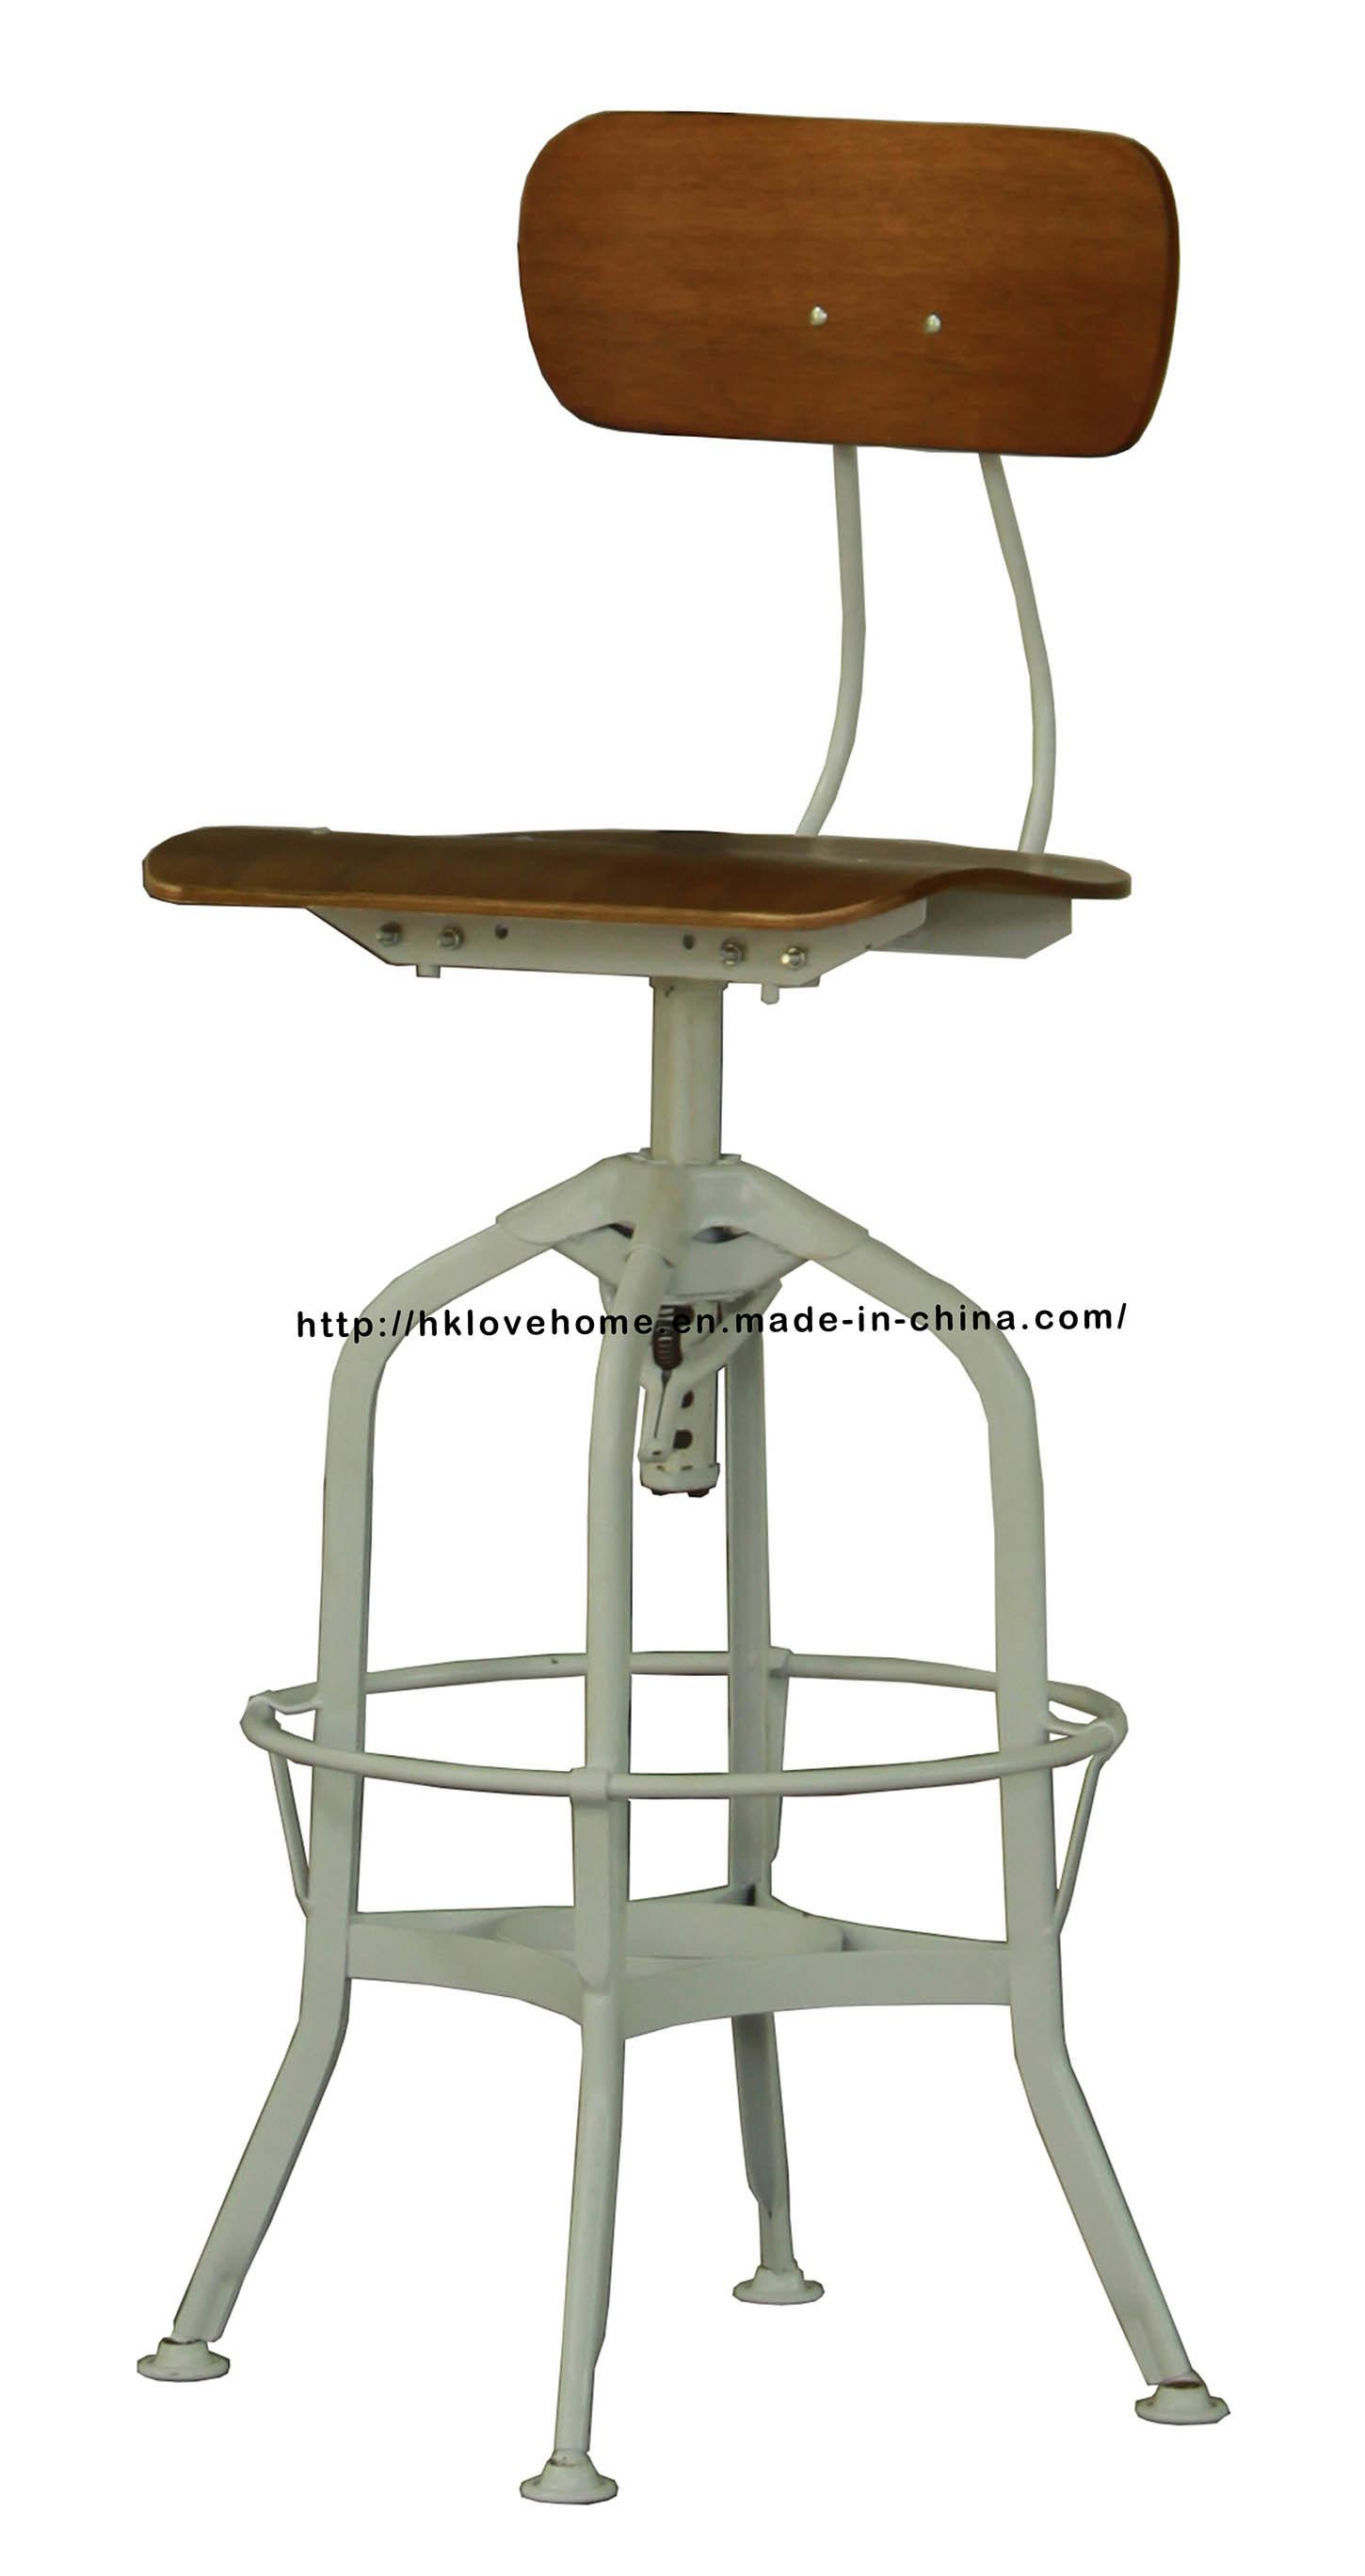 Groovy Hot Item Replica Industrial Steel Restaurant Furniture Dining Toledo Bar Stools Chair Short Links Chair Design For Home Short Linksinfo